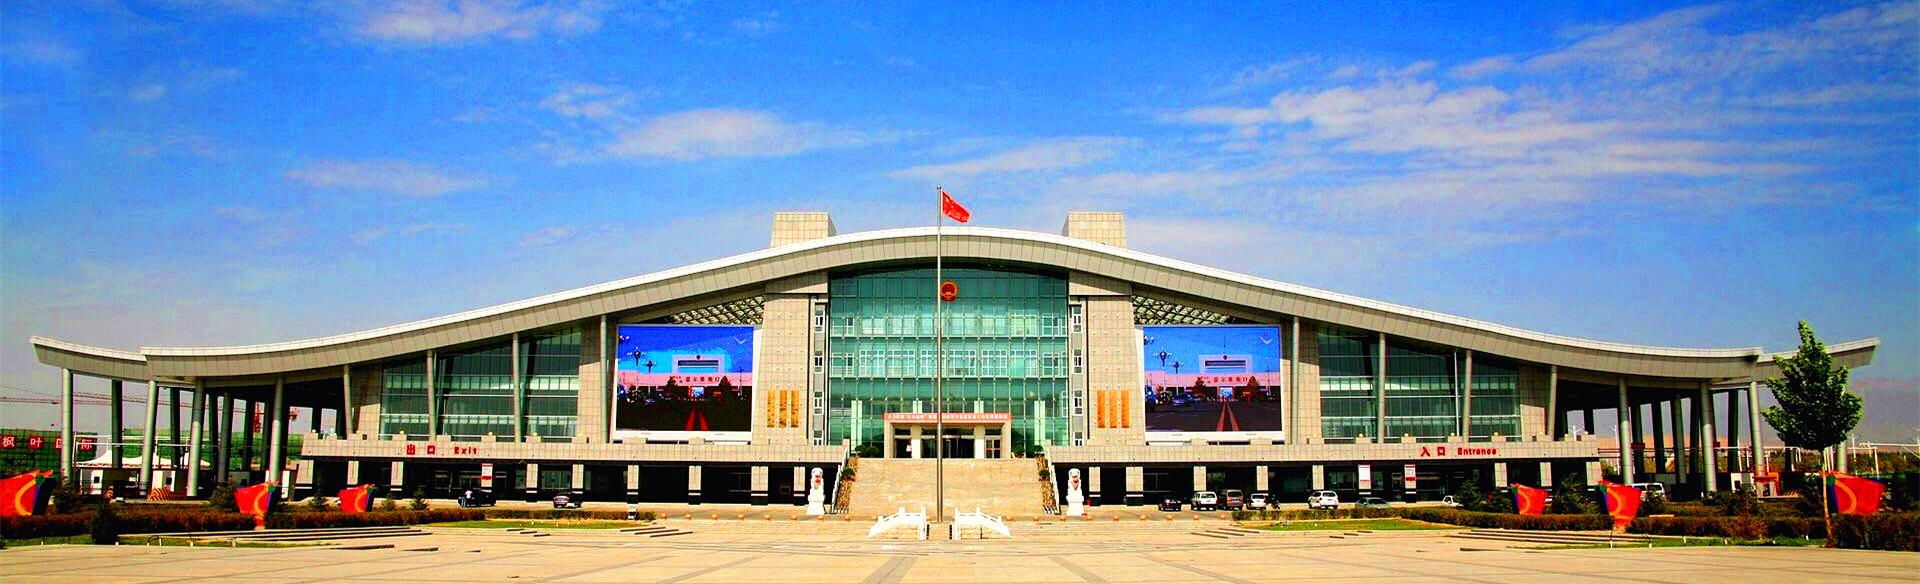 Xinjiang Border Transfer